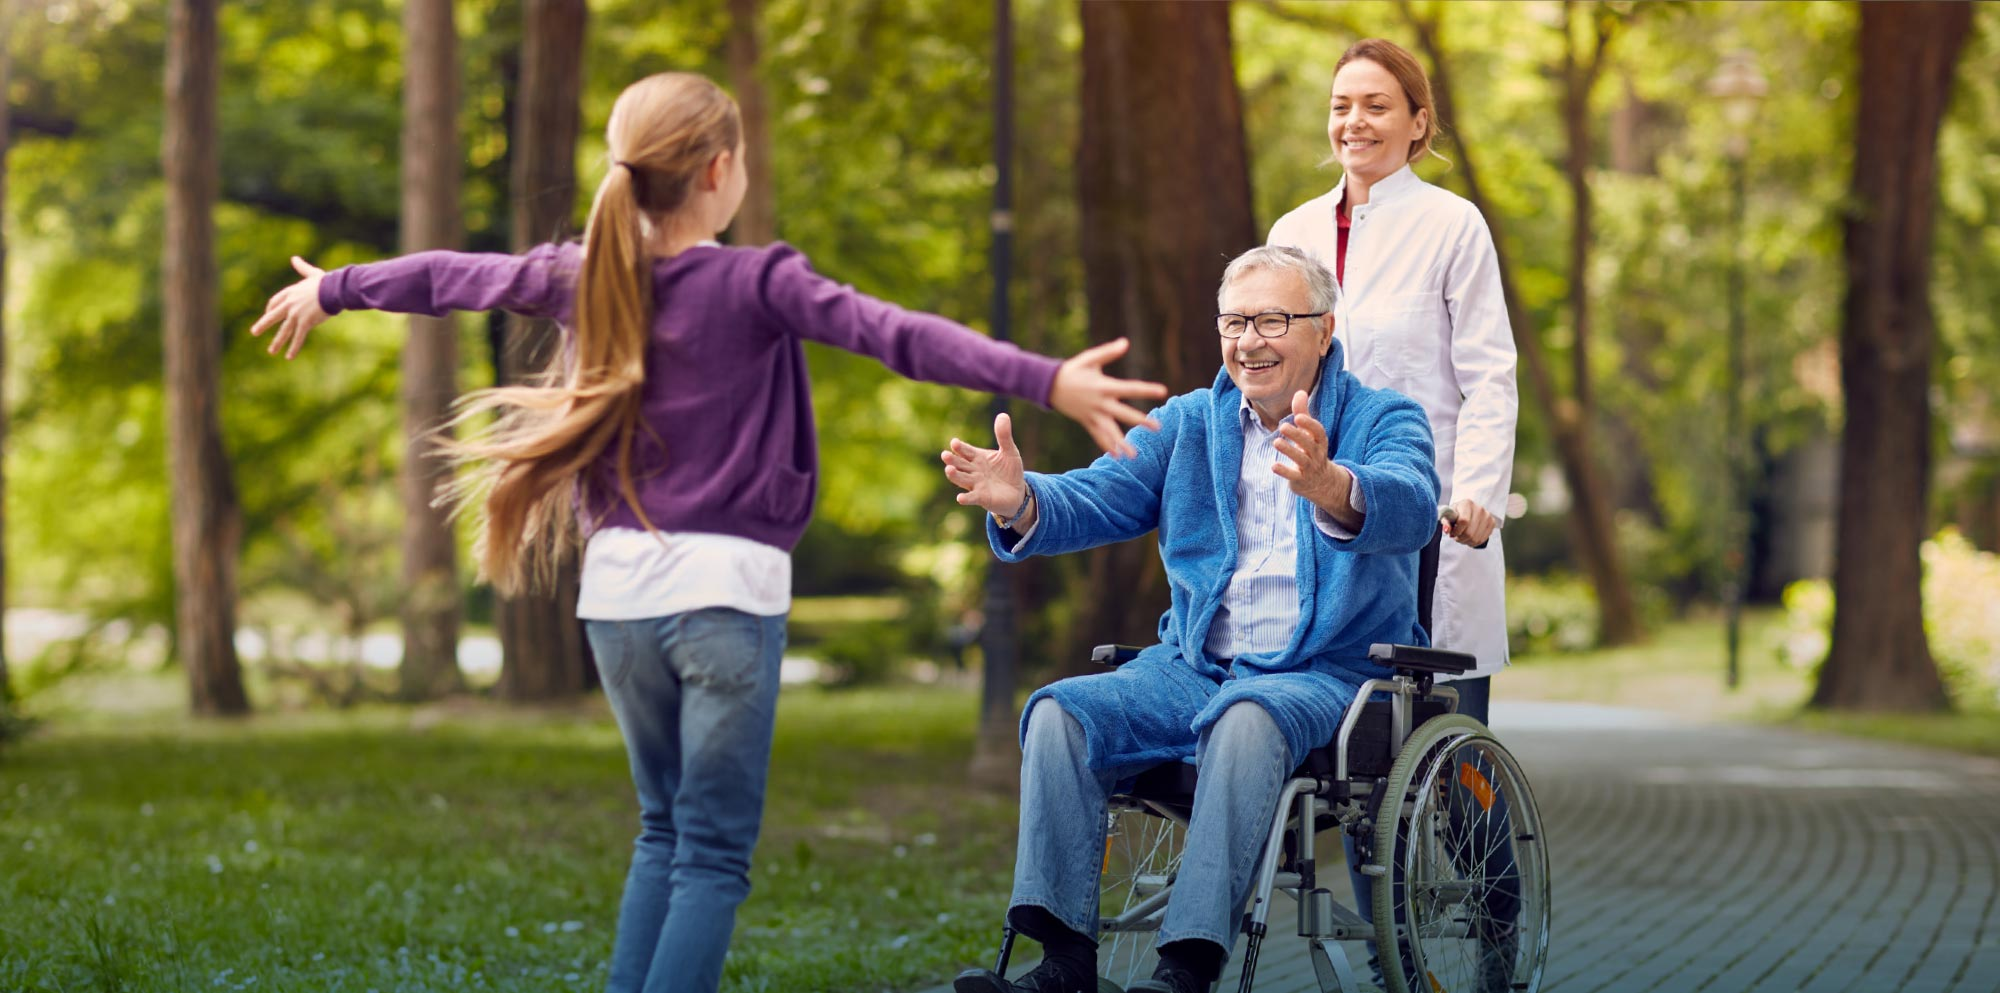 Hugging grandpa in a wheelchair